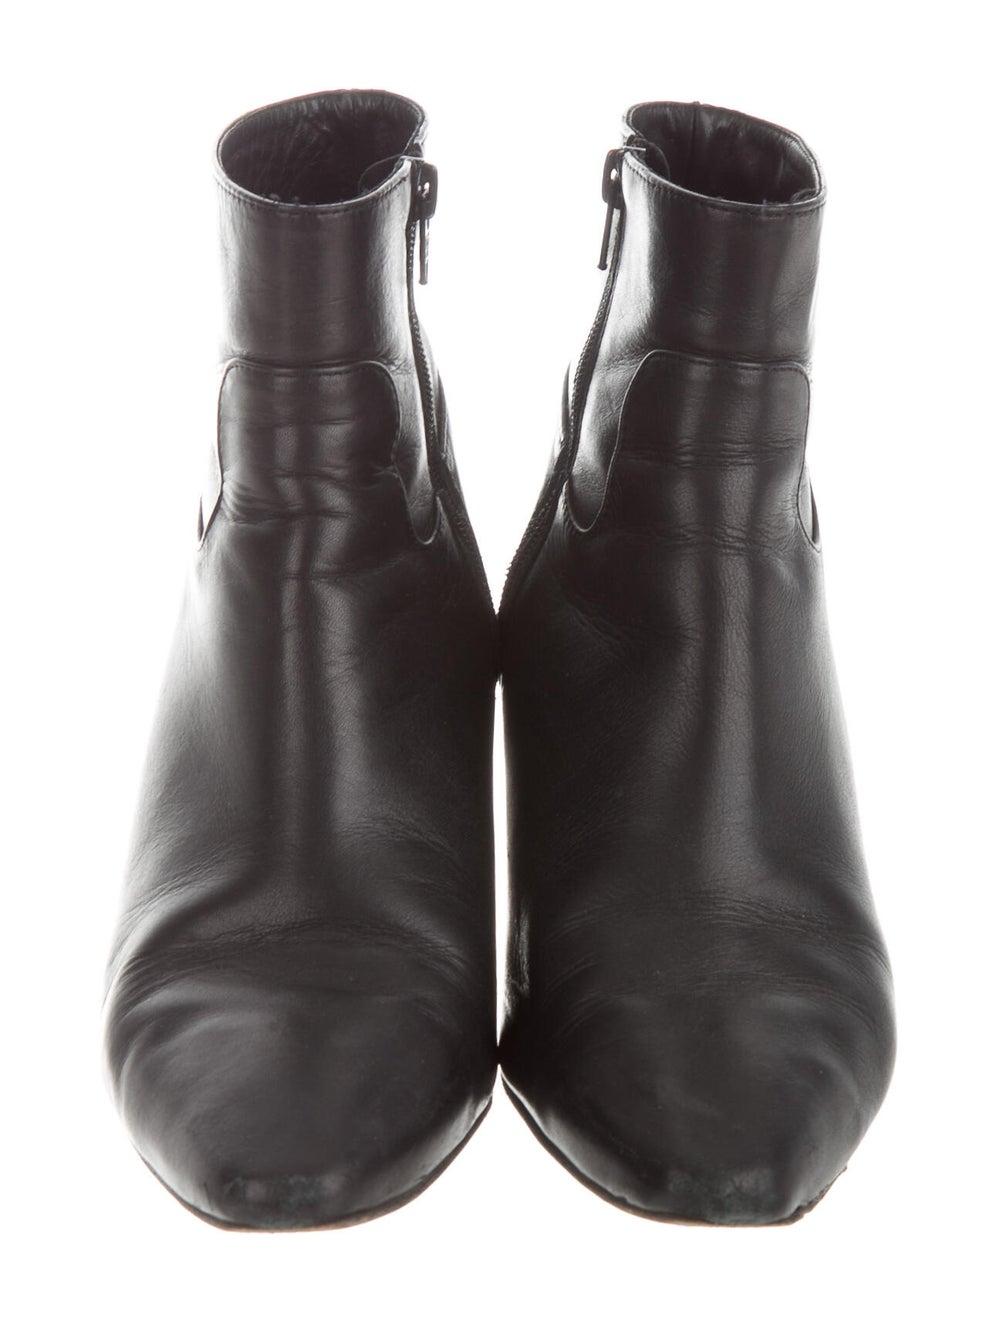 Miista Leather Boots Black - image 3